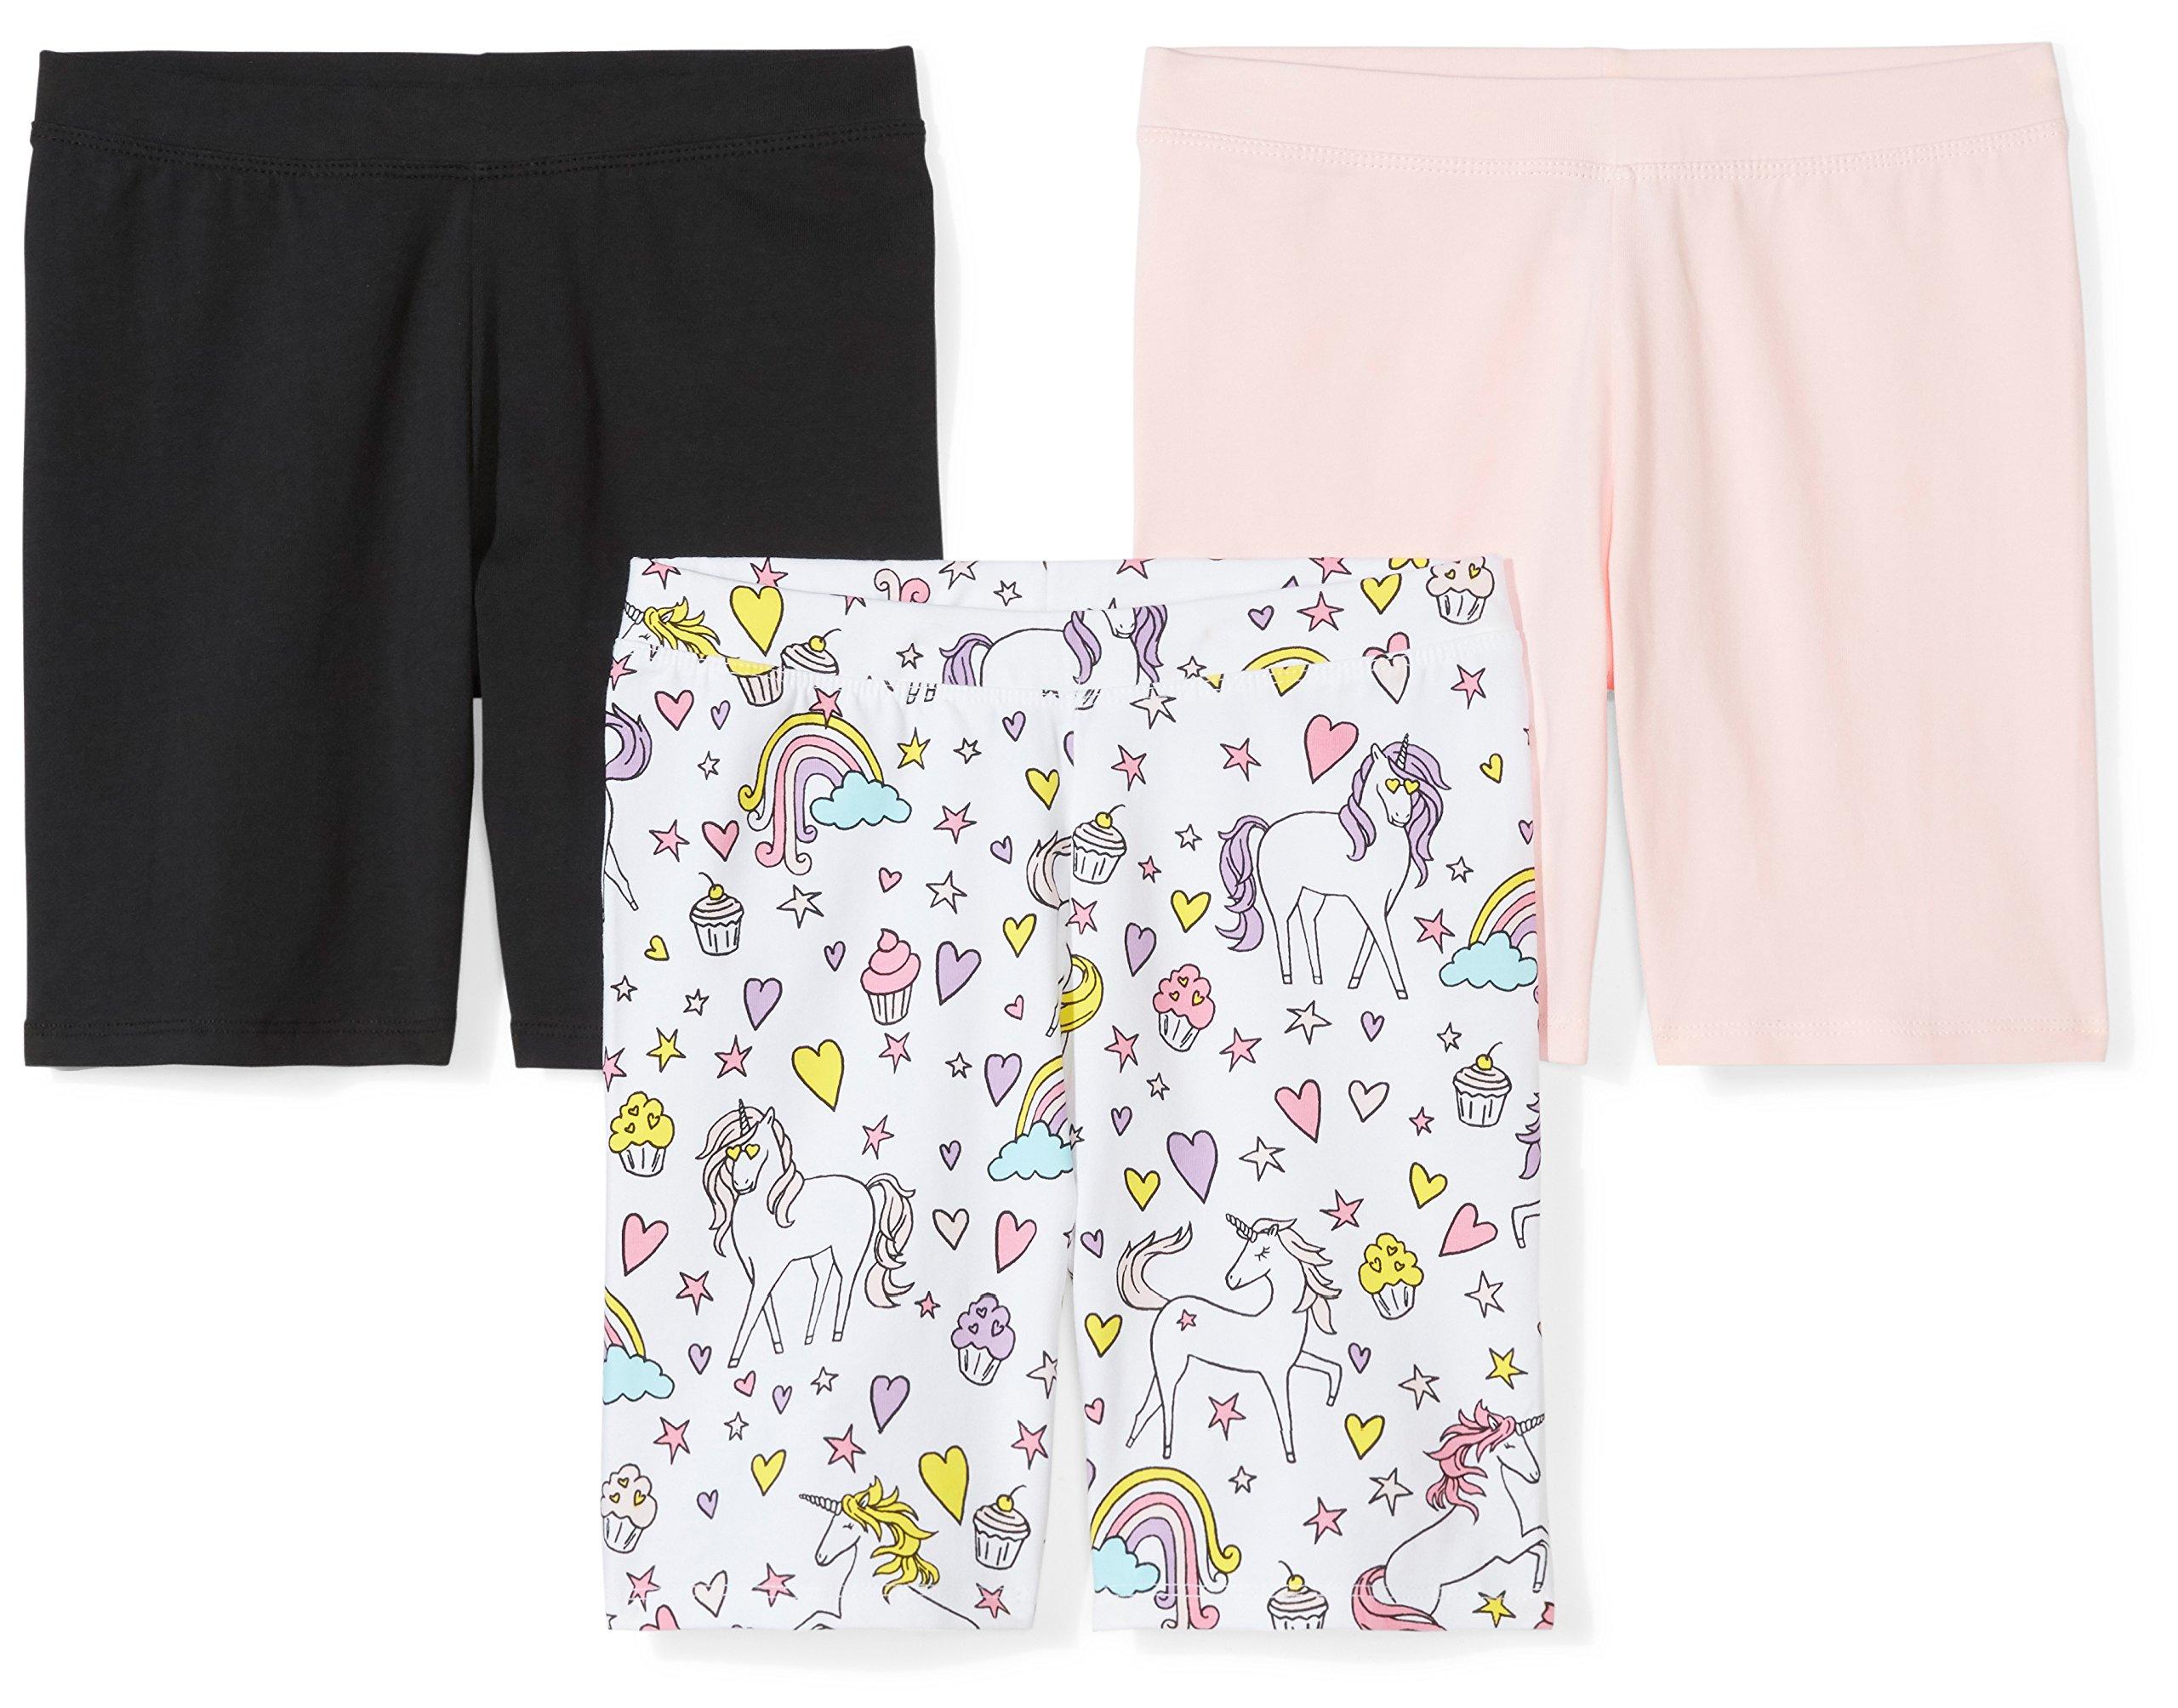 Spotted Zebra Little Girls' 3-Pack Bike Shorts, Unicorn, Small (6-7)